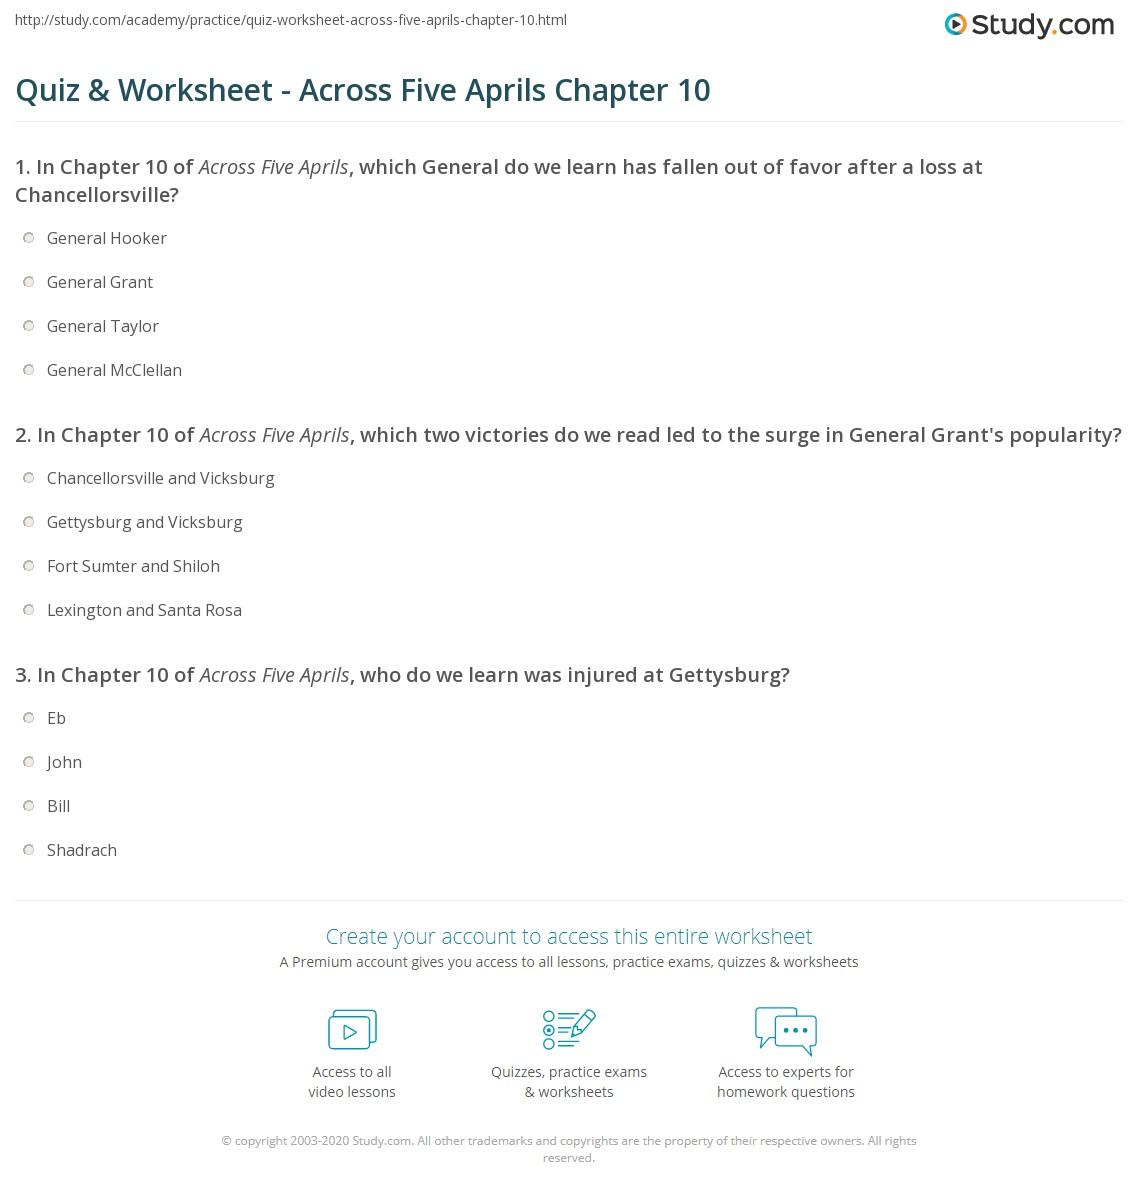 worksheet Five Number Summary Worksheet quiz worksheet across five aprils chapter 10 study com print summary worksheet